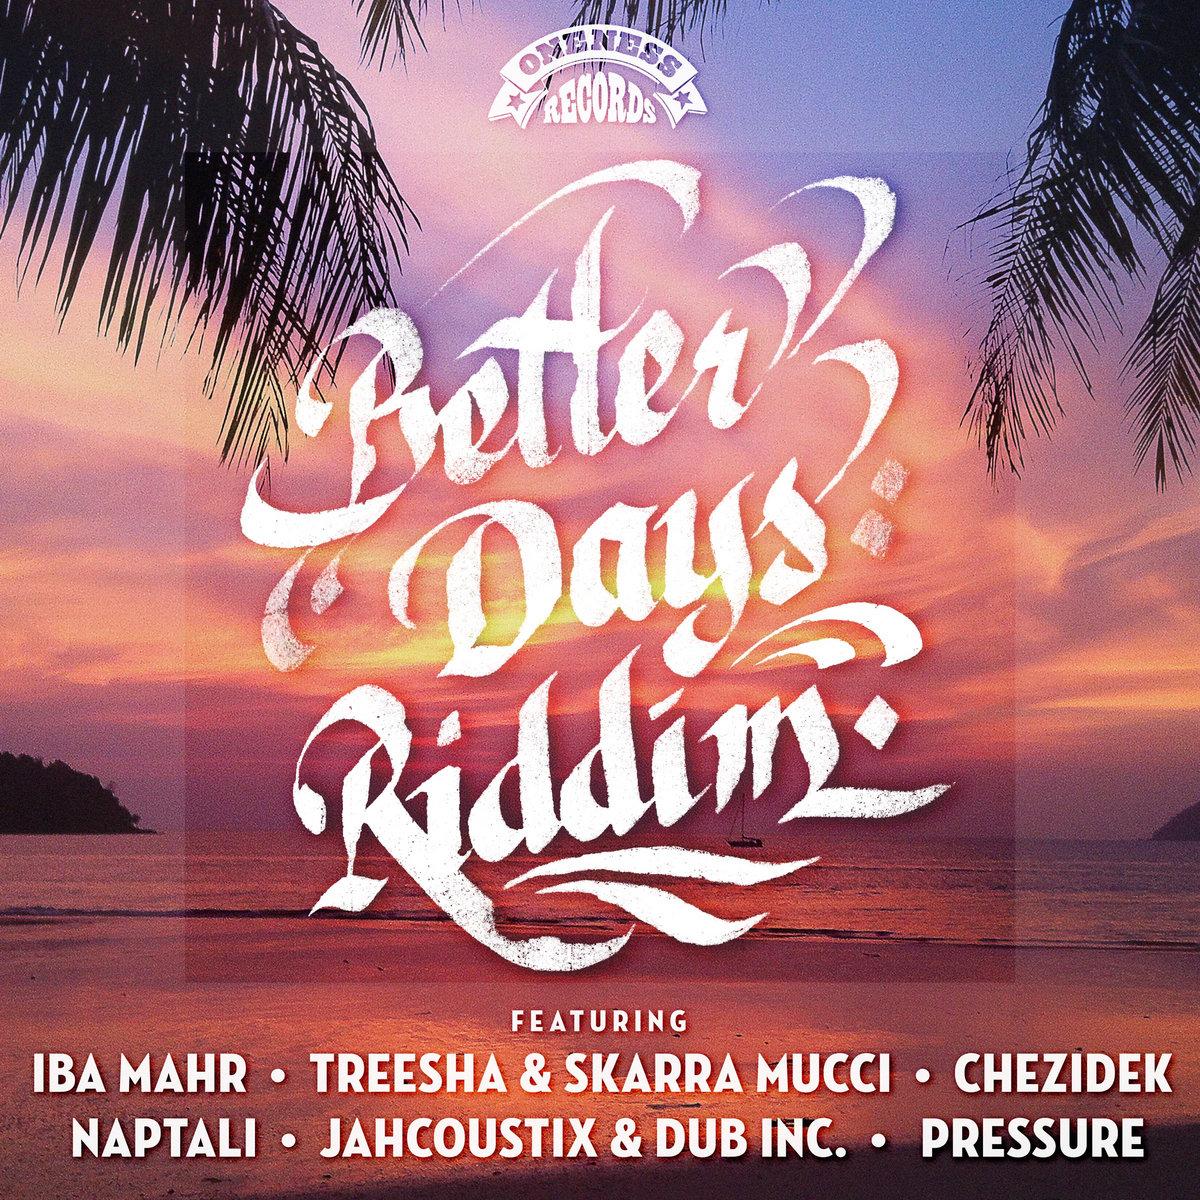 Better Days Riddim Instrumental | Oneness-Records